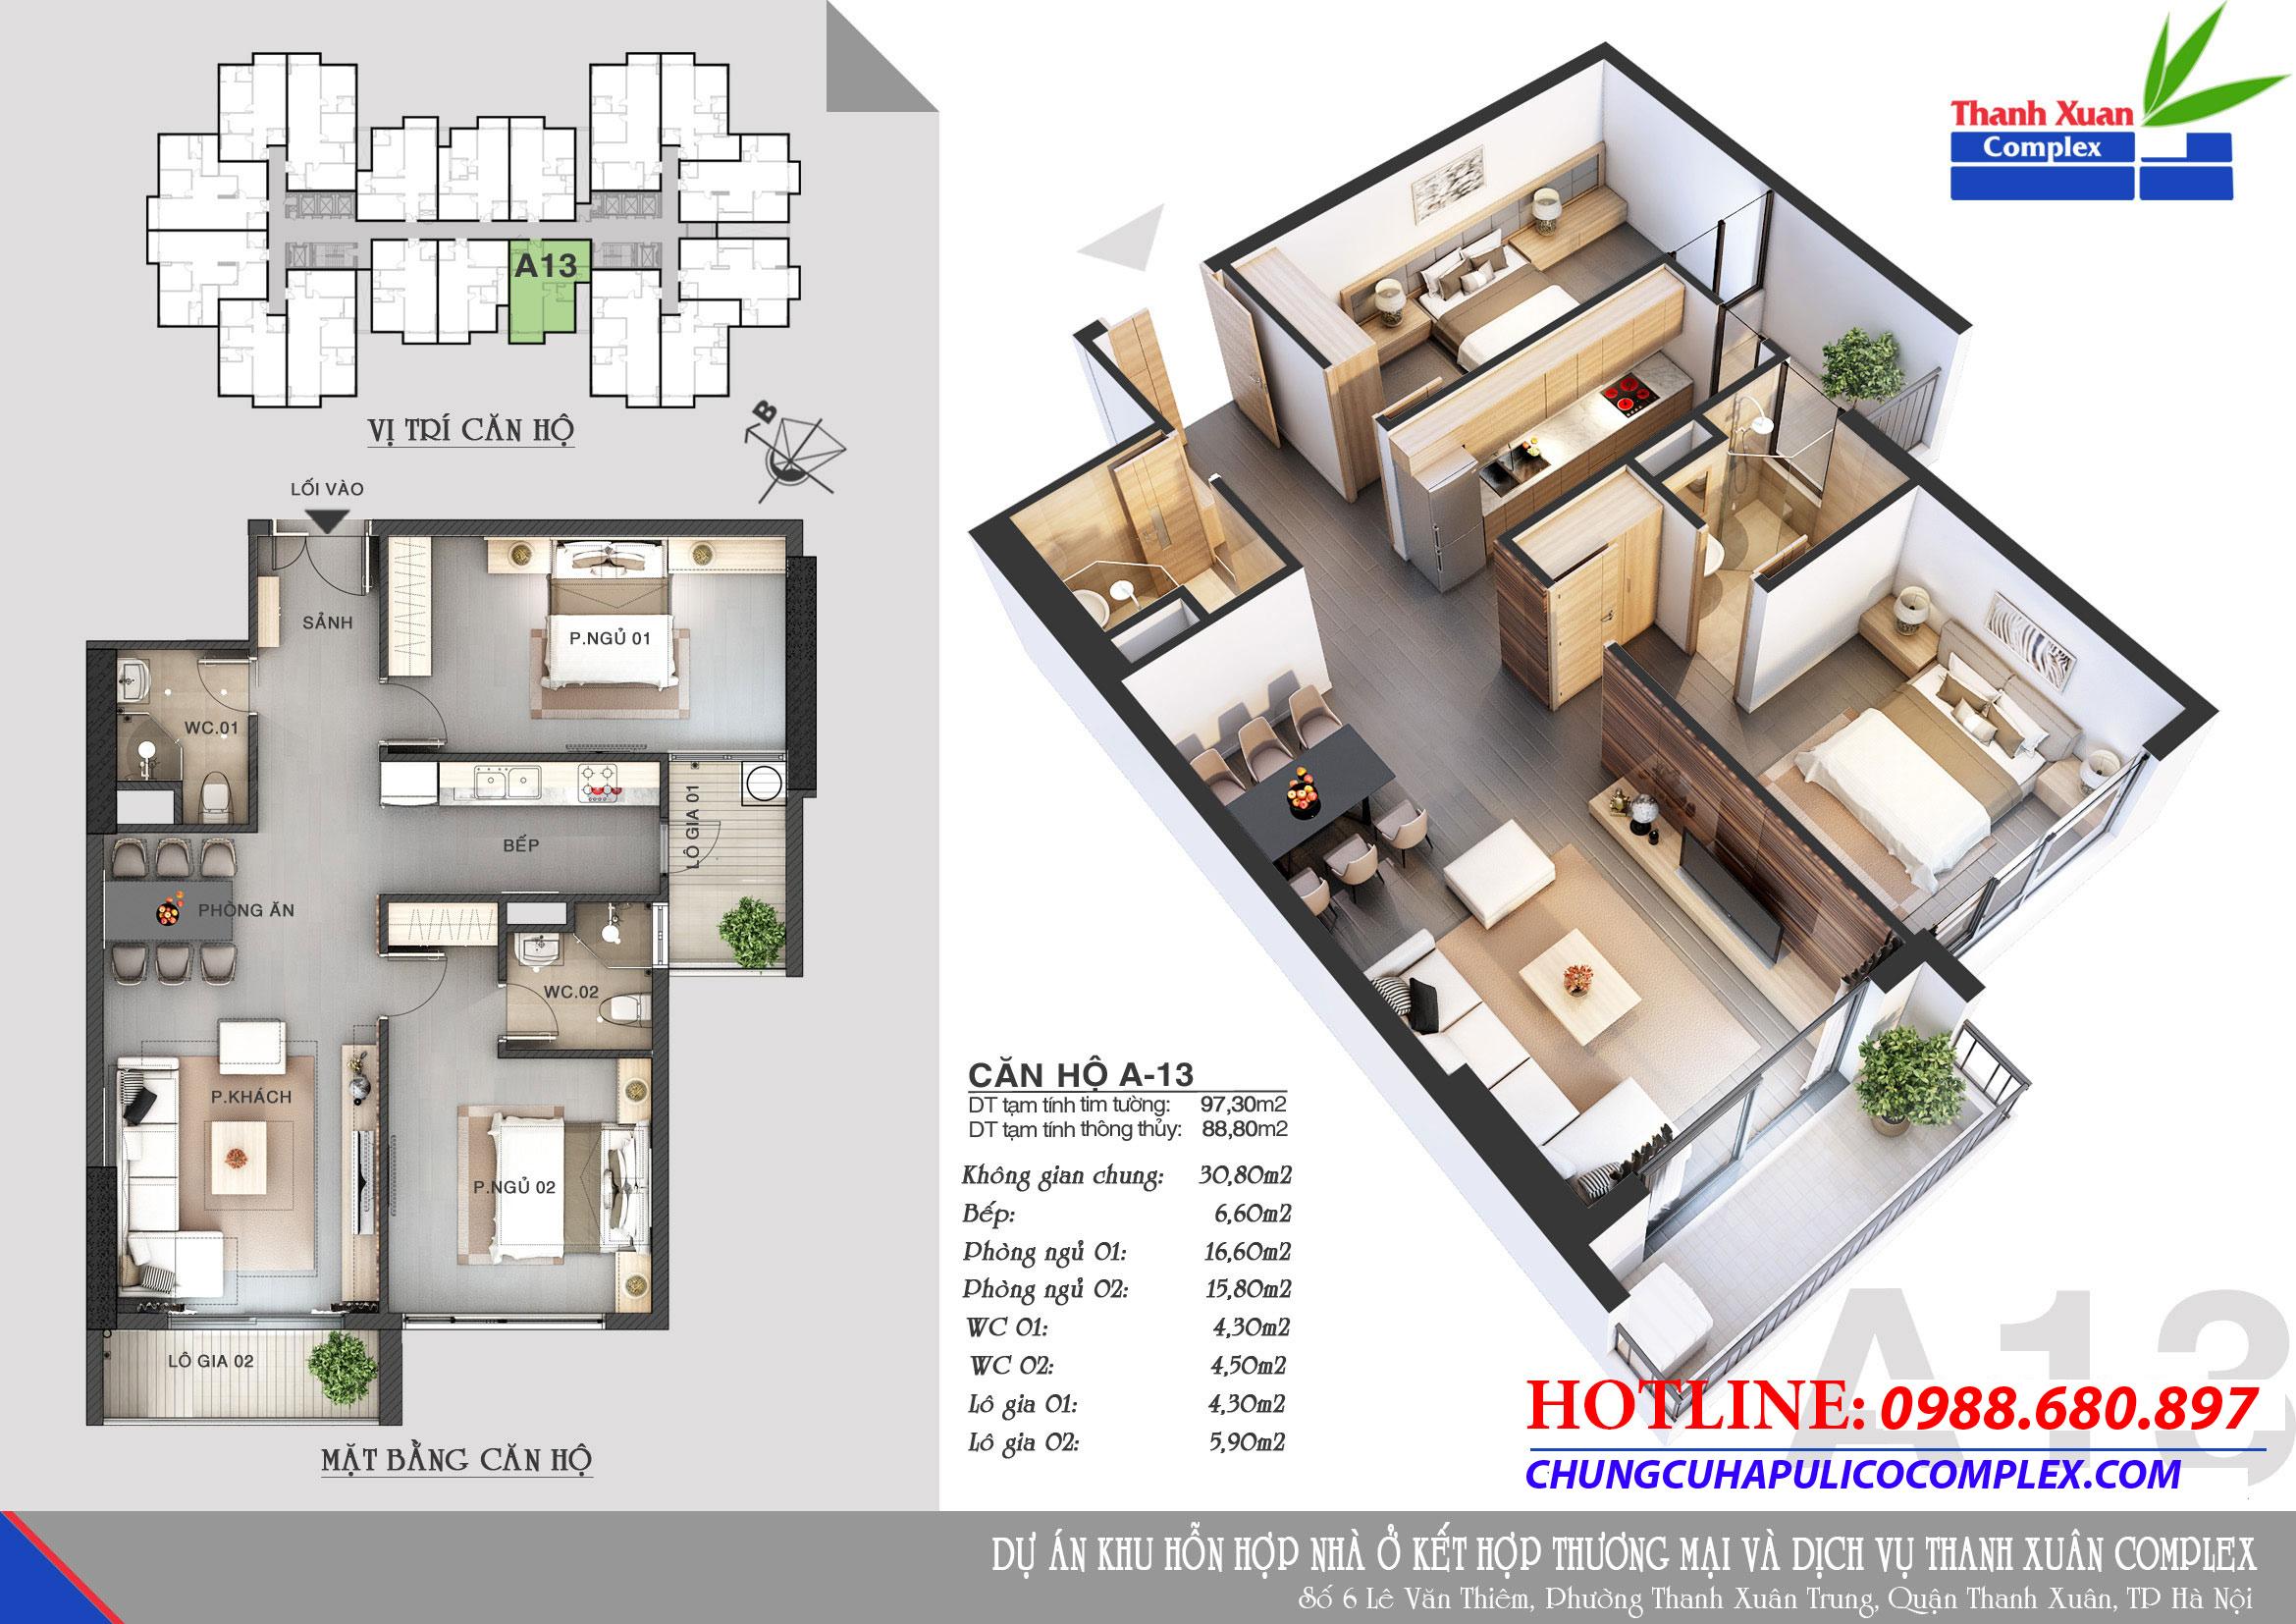 HSB_Thanhxuan-complex_CH-A13_suachotT42016-copy